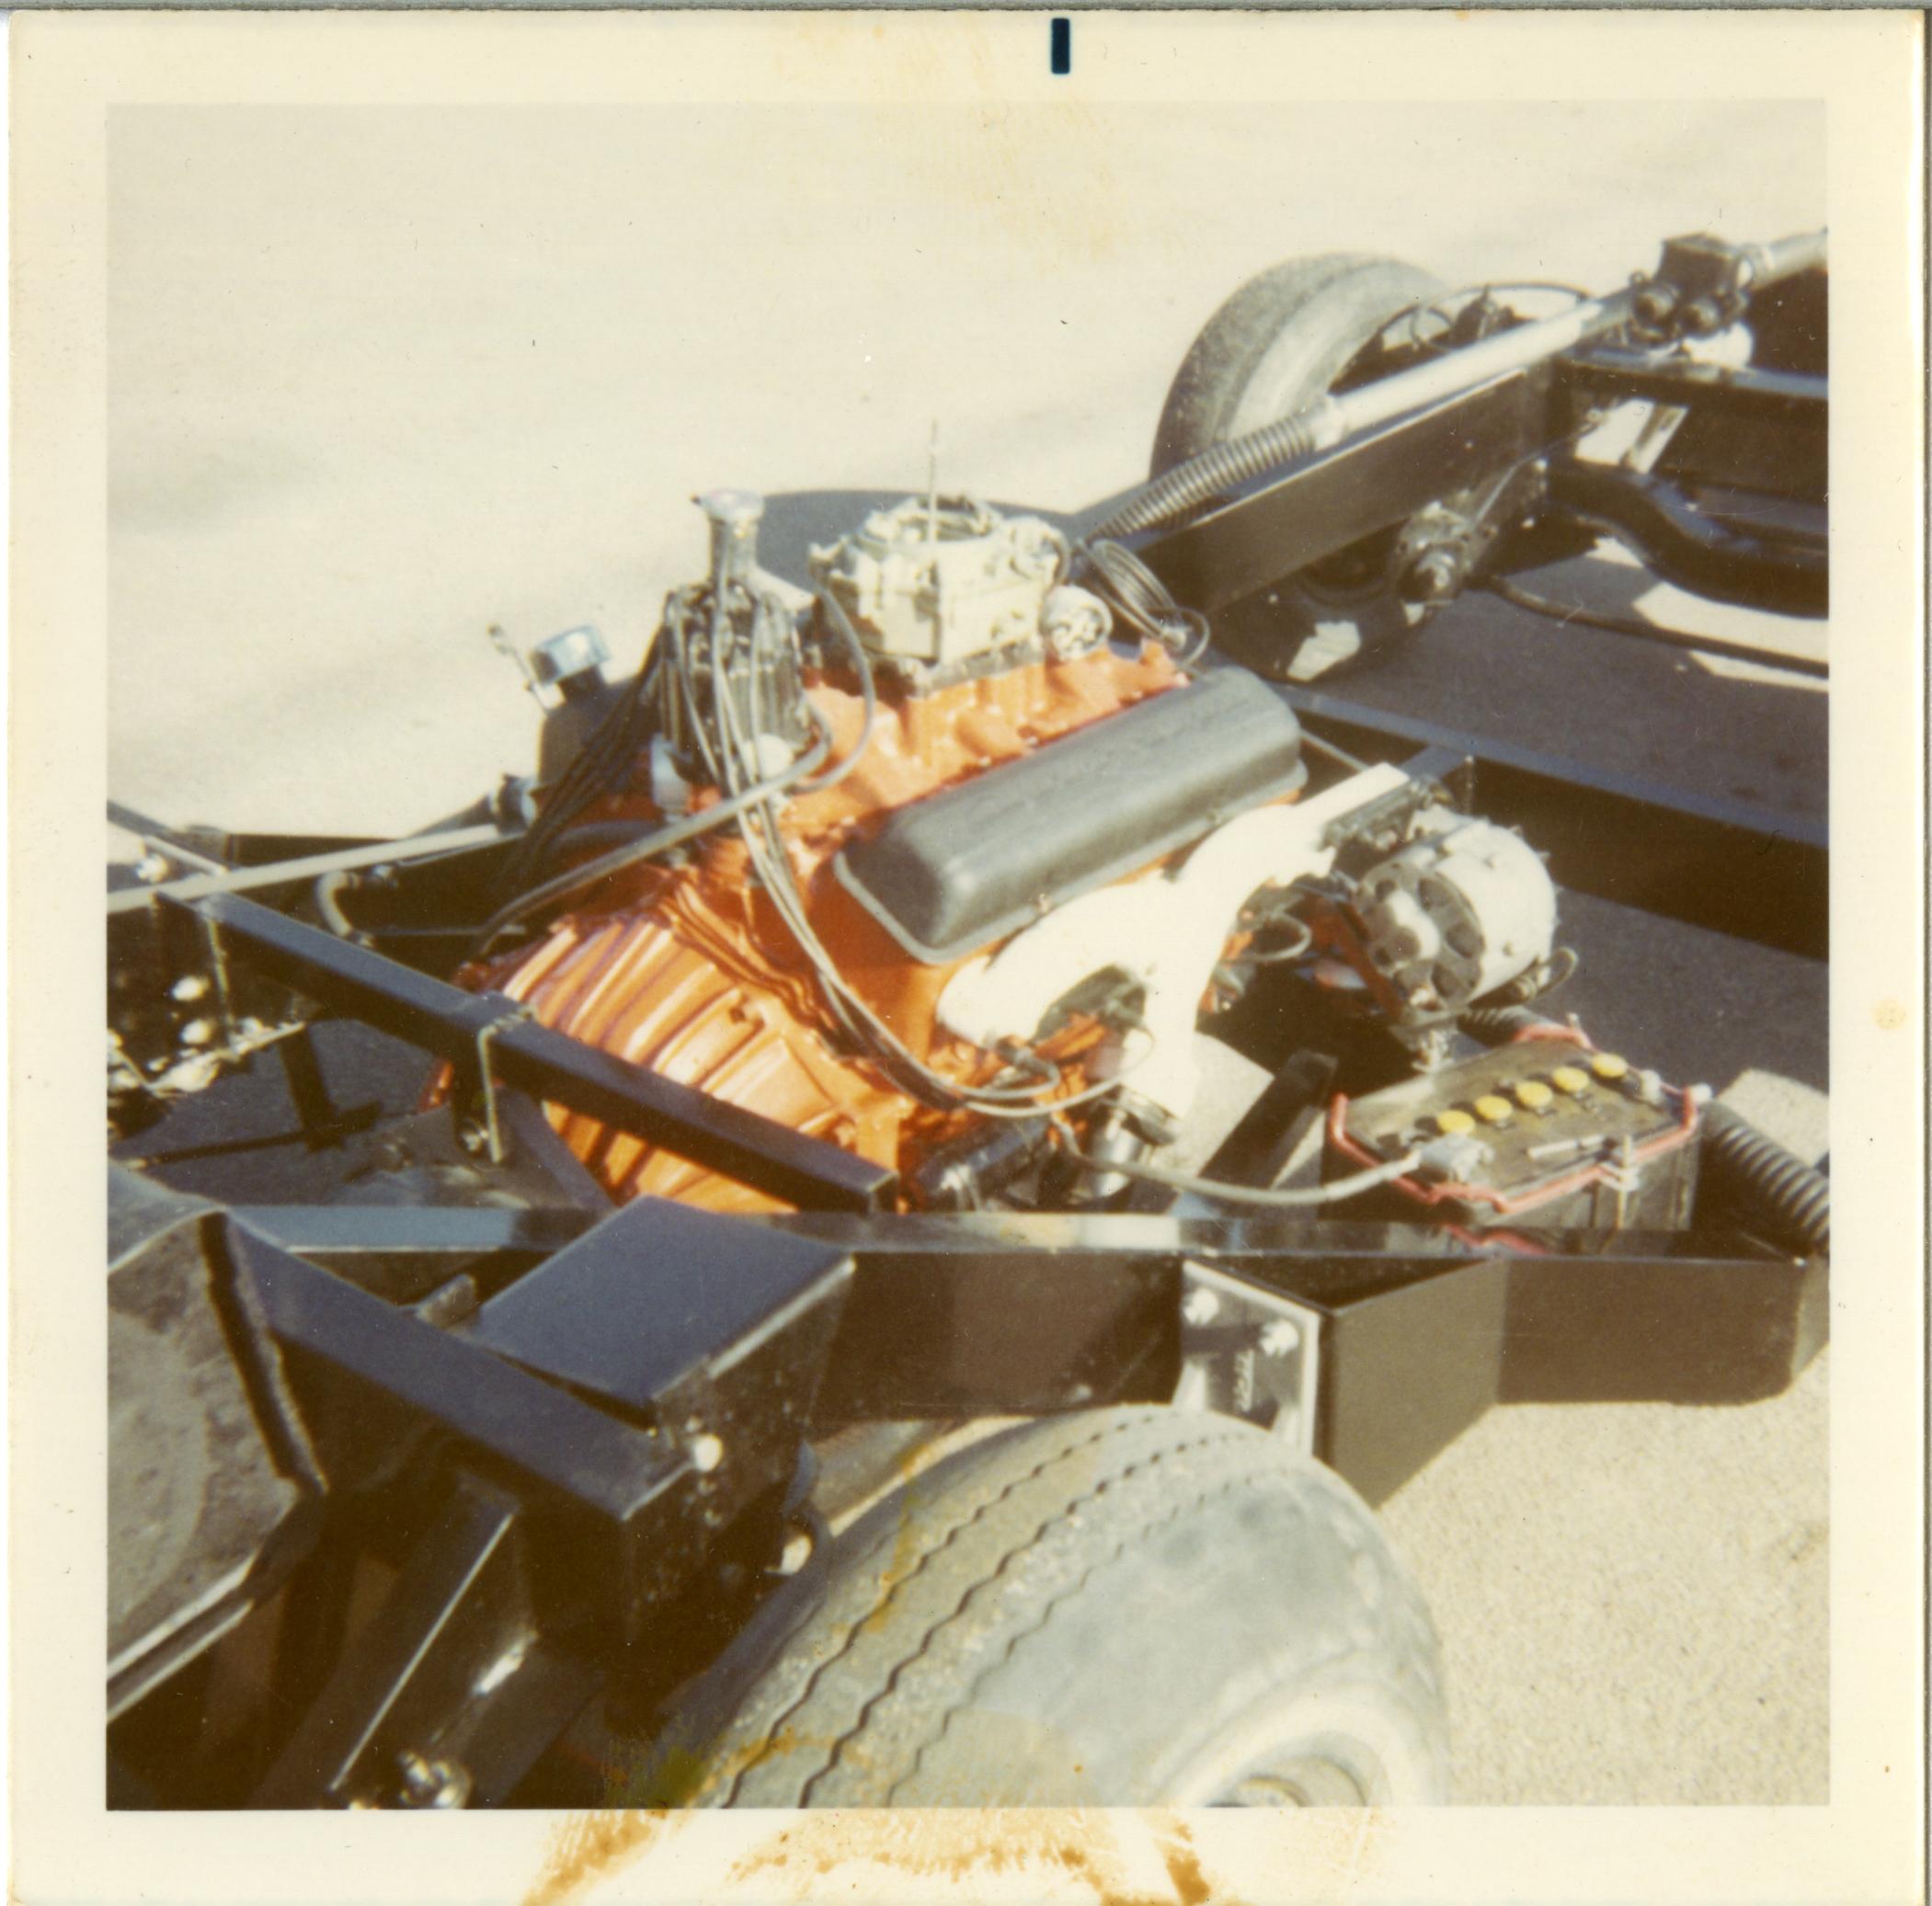 vintage picture of a Corvette engine